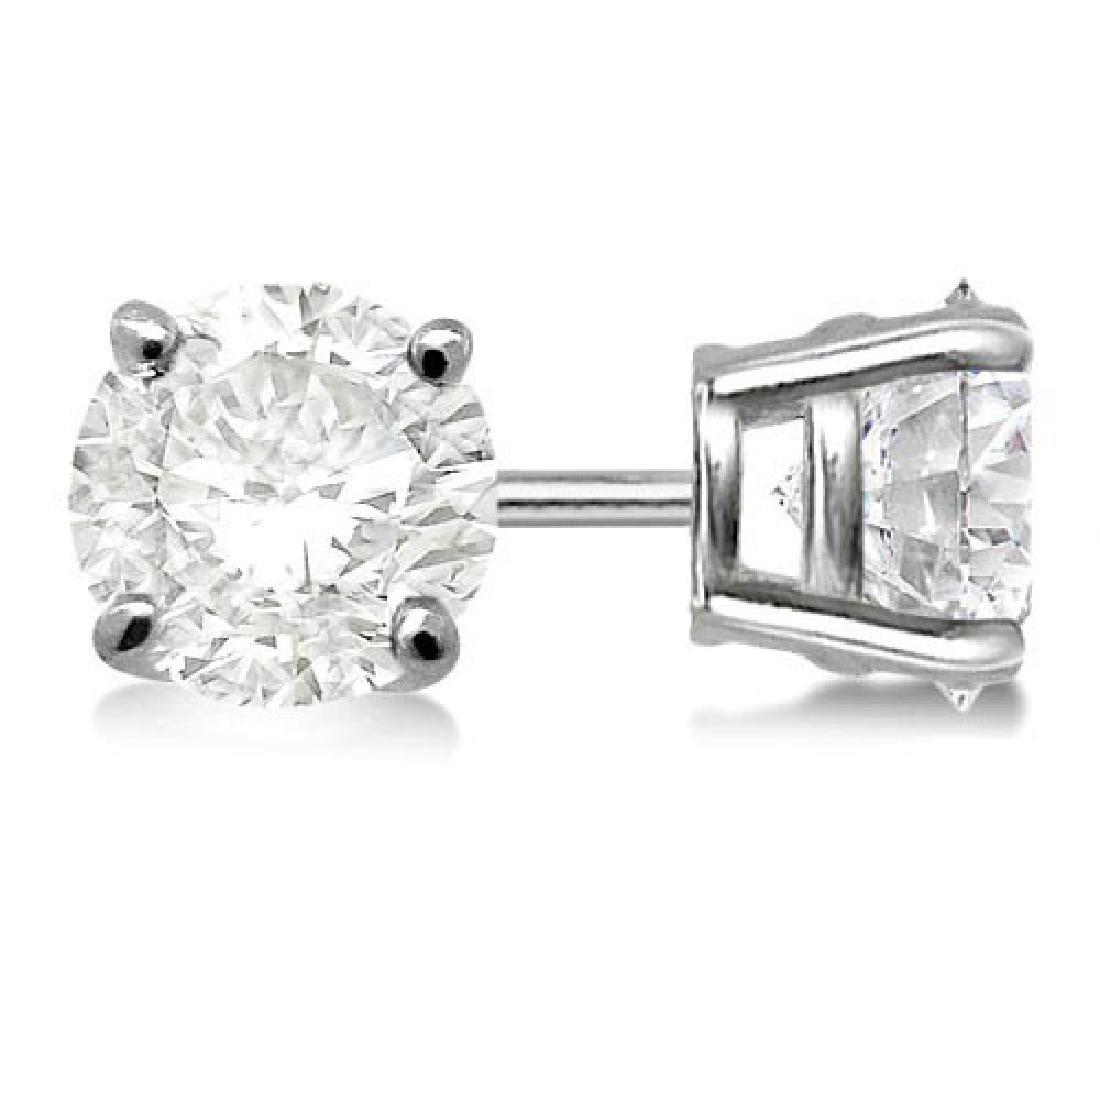 Certified 1.21 CTW Round Diamond Stud Earrings J/SI1